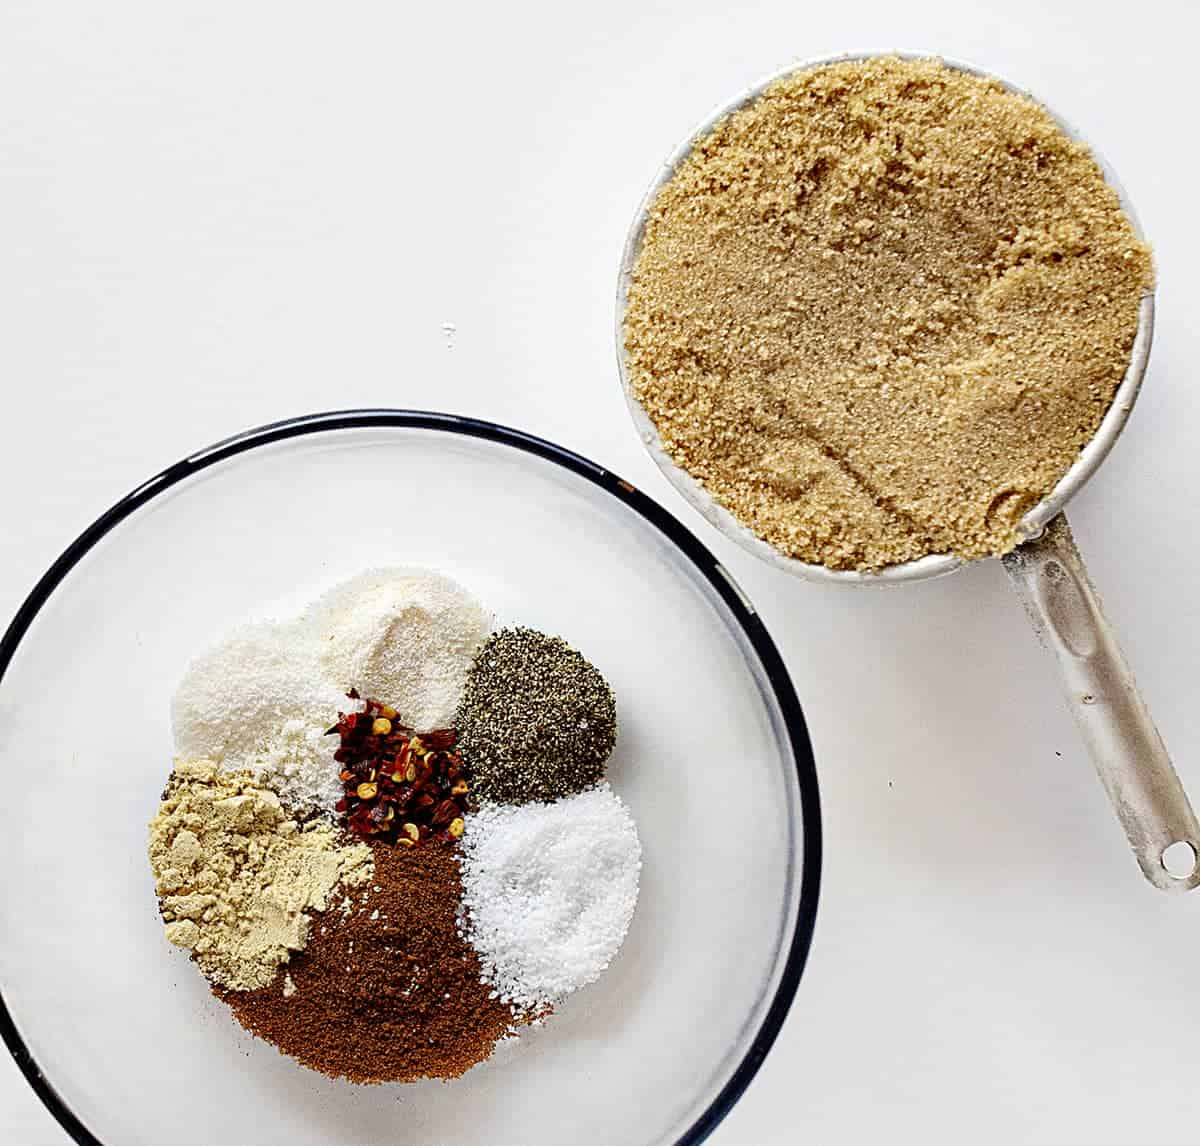 Ingredients for Pumpkin Spice Pork Tenderloin